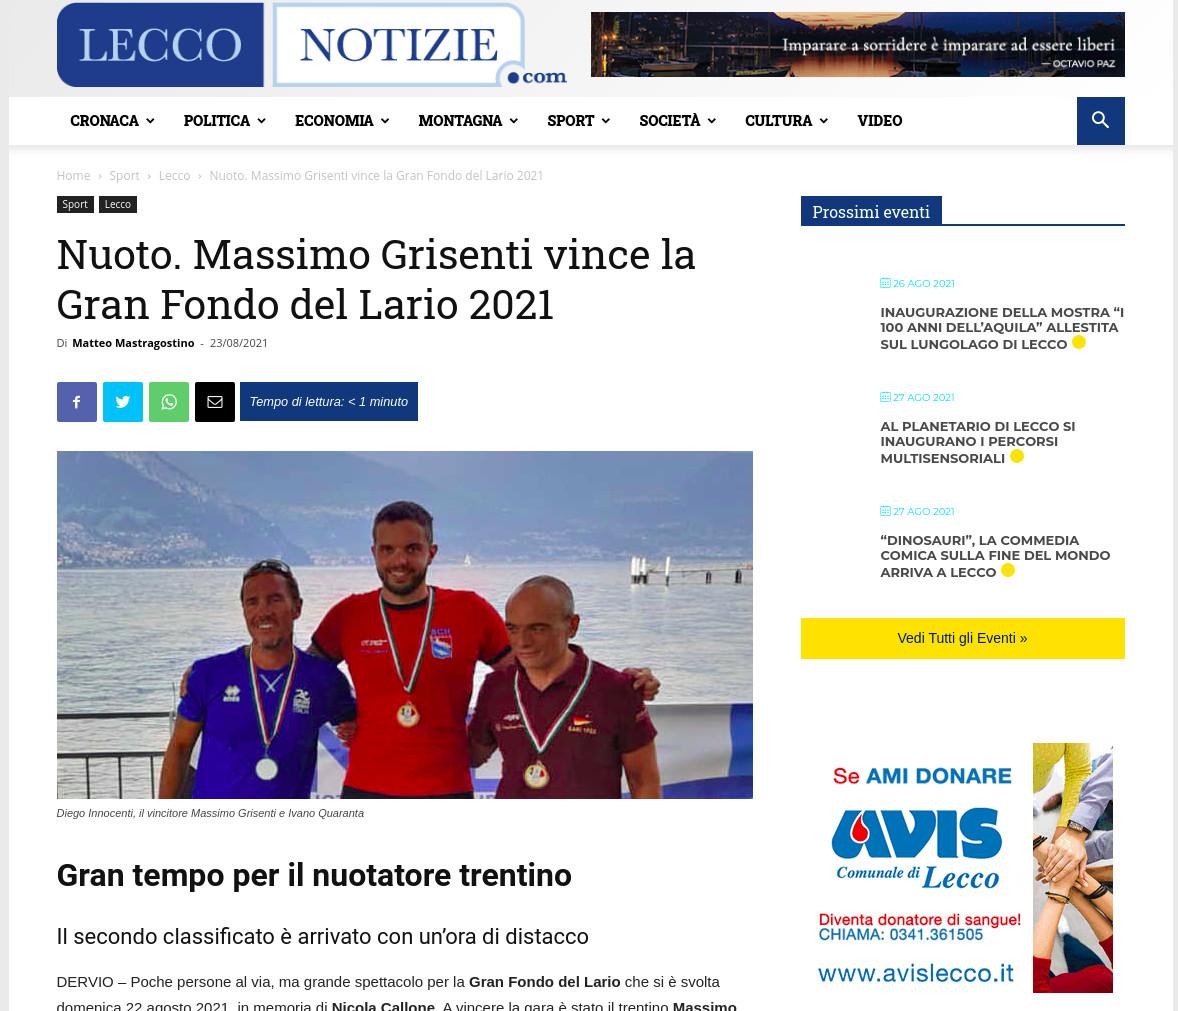 GF Lago di Como 2021 su LeggoNotizie.com